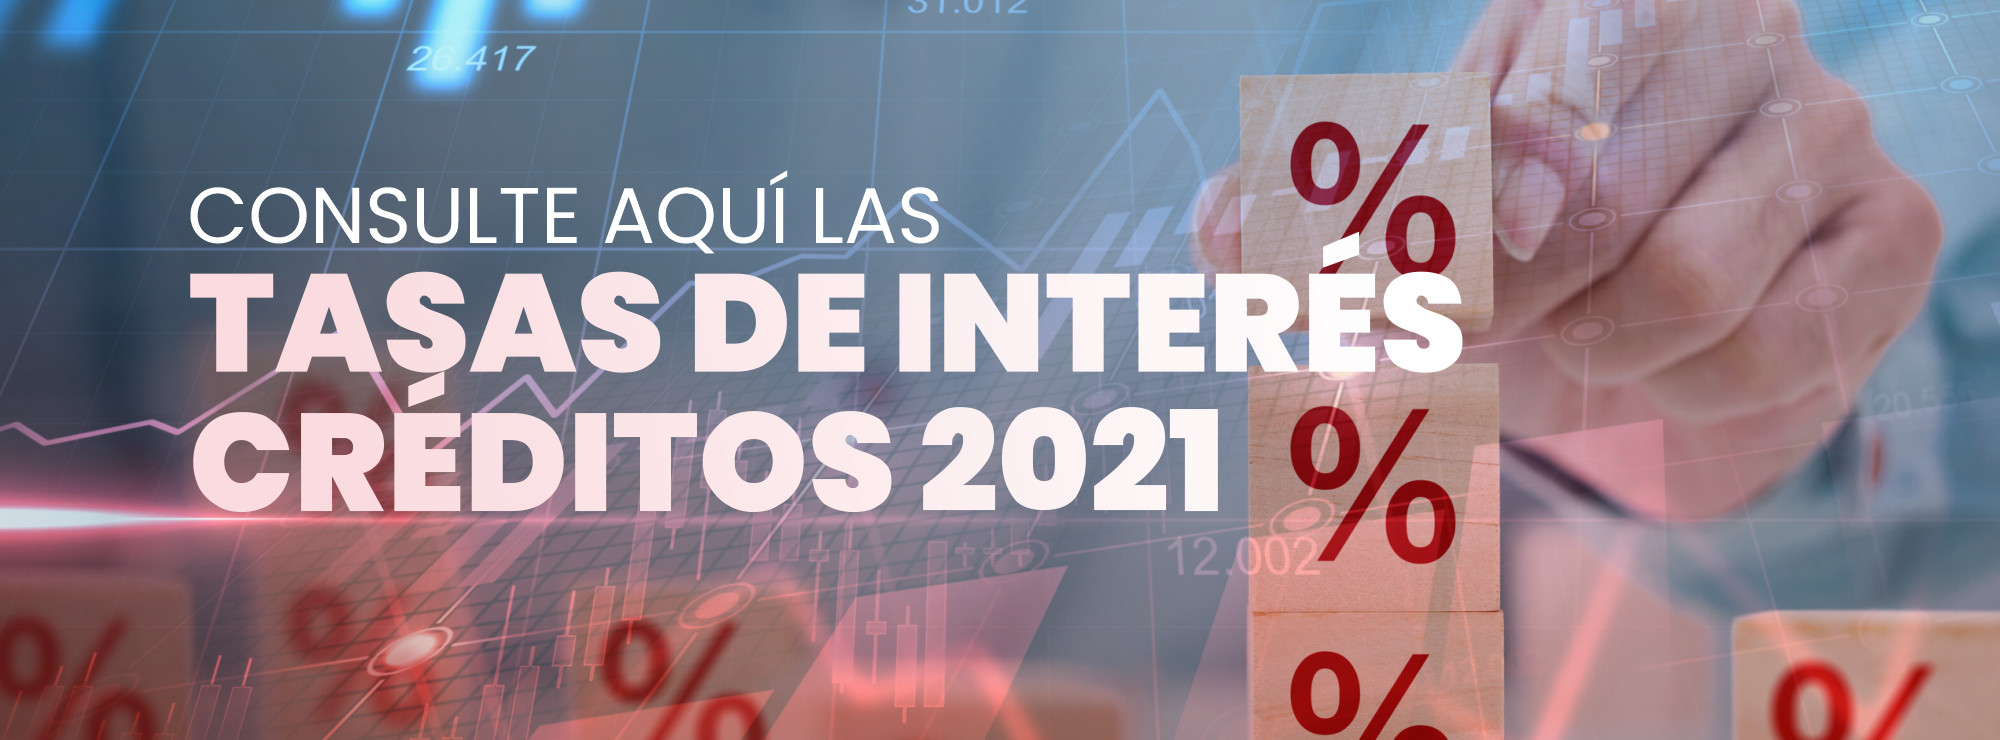 Tasas De Interés Créditos 2021